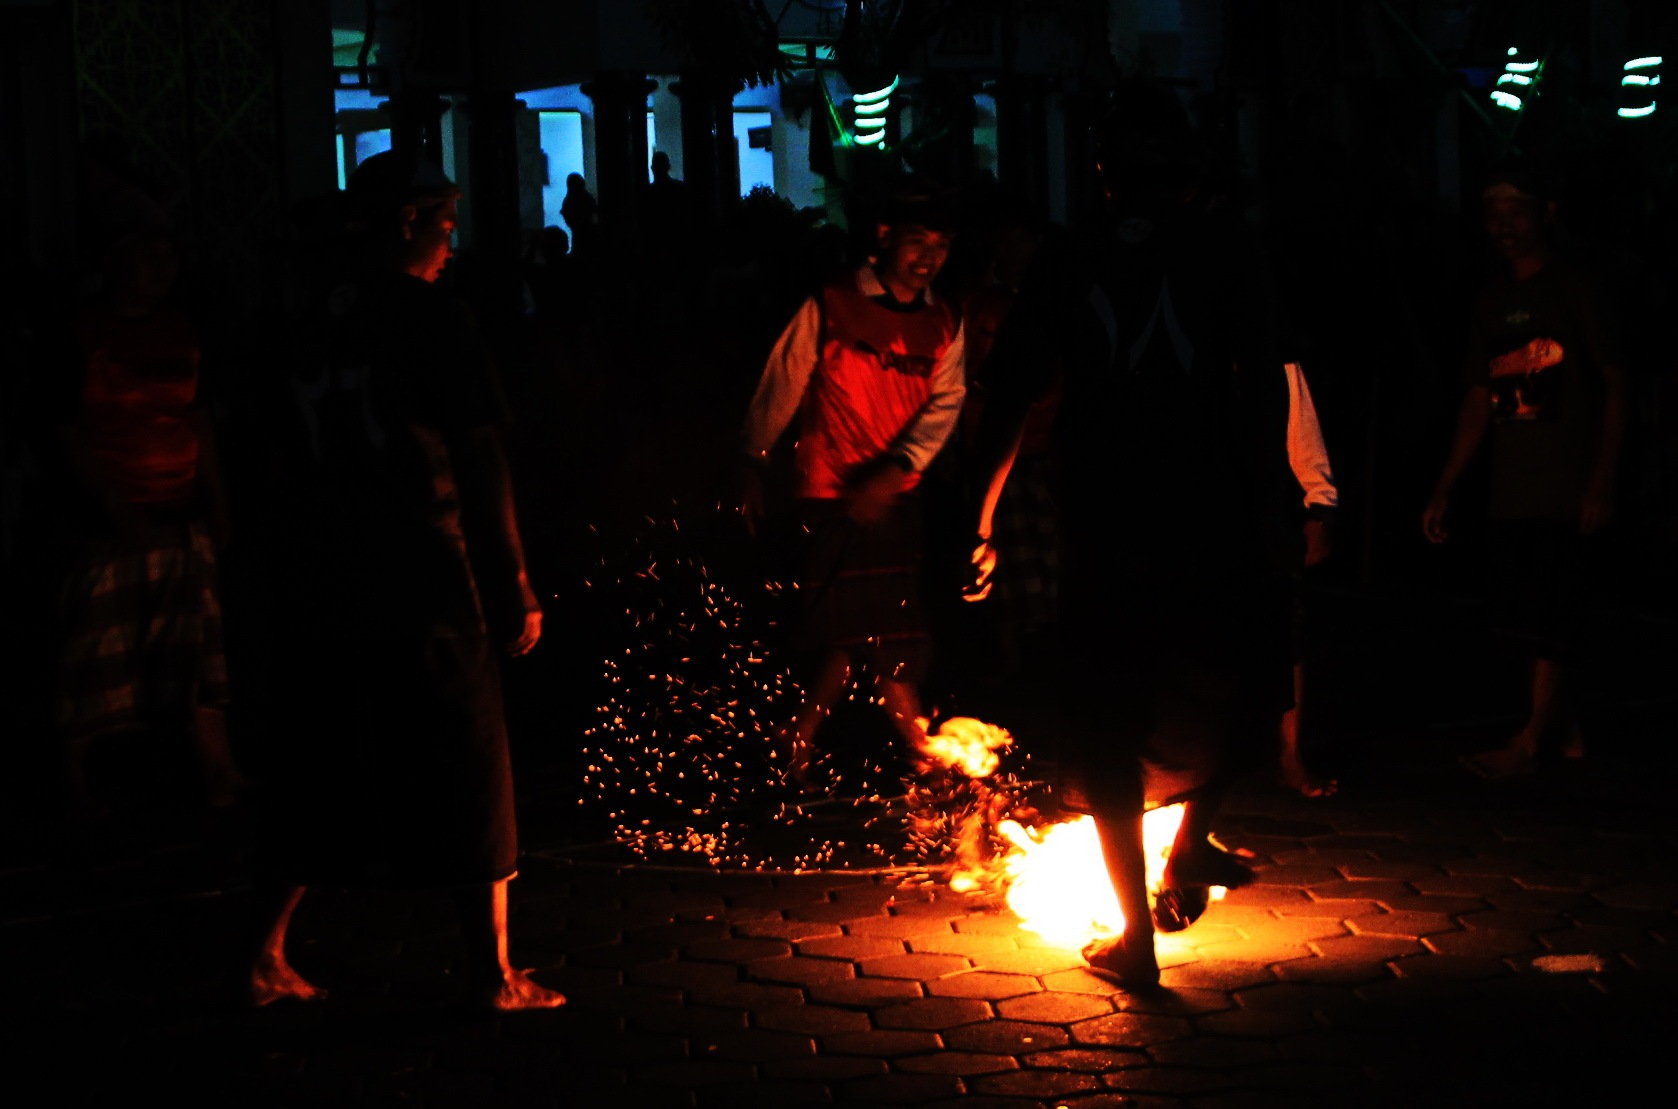 fire football by Omah Semoet